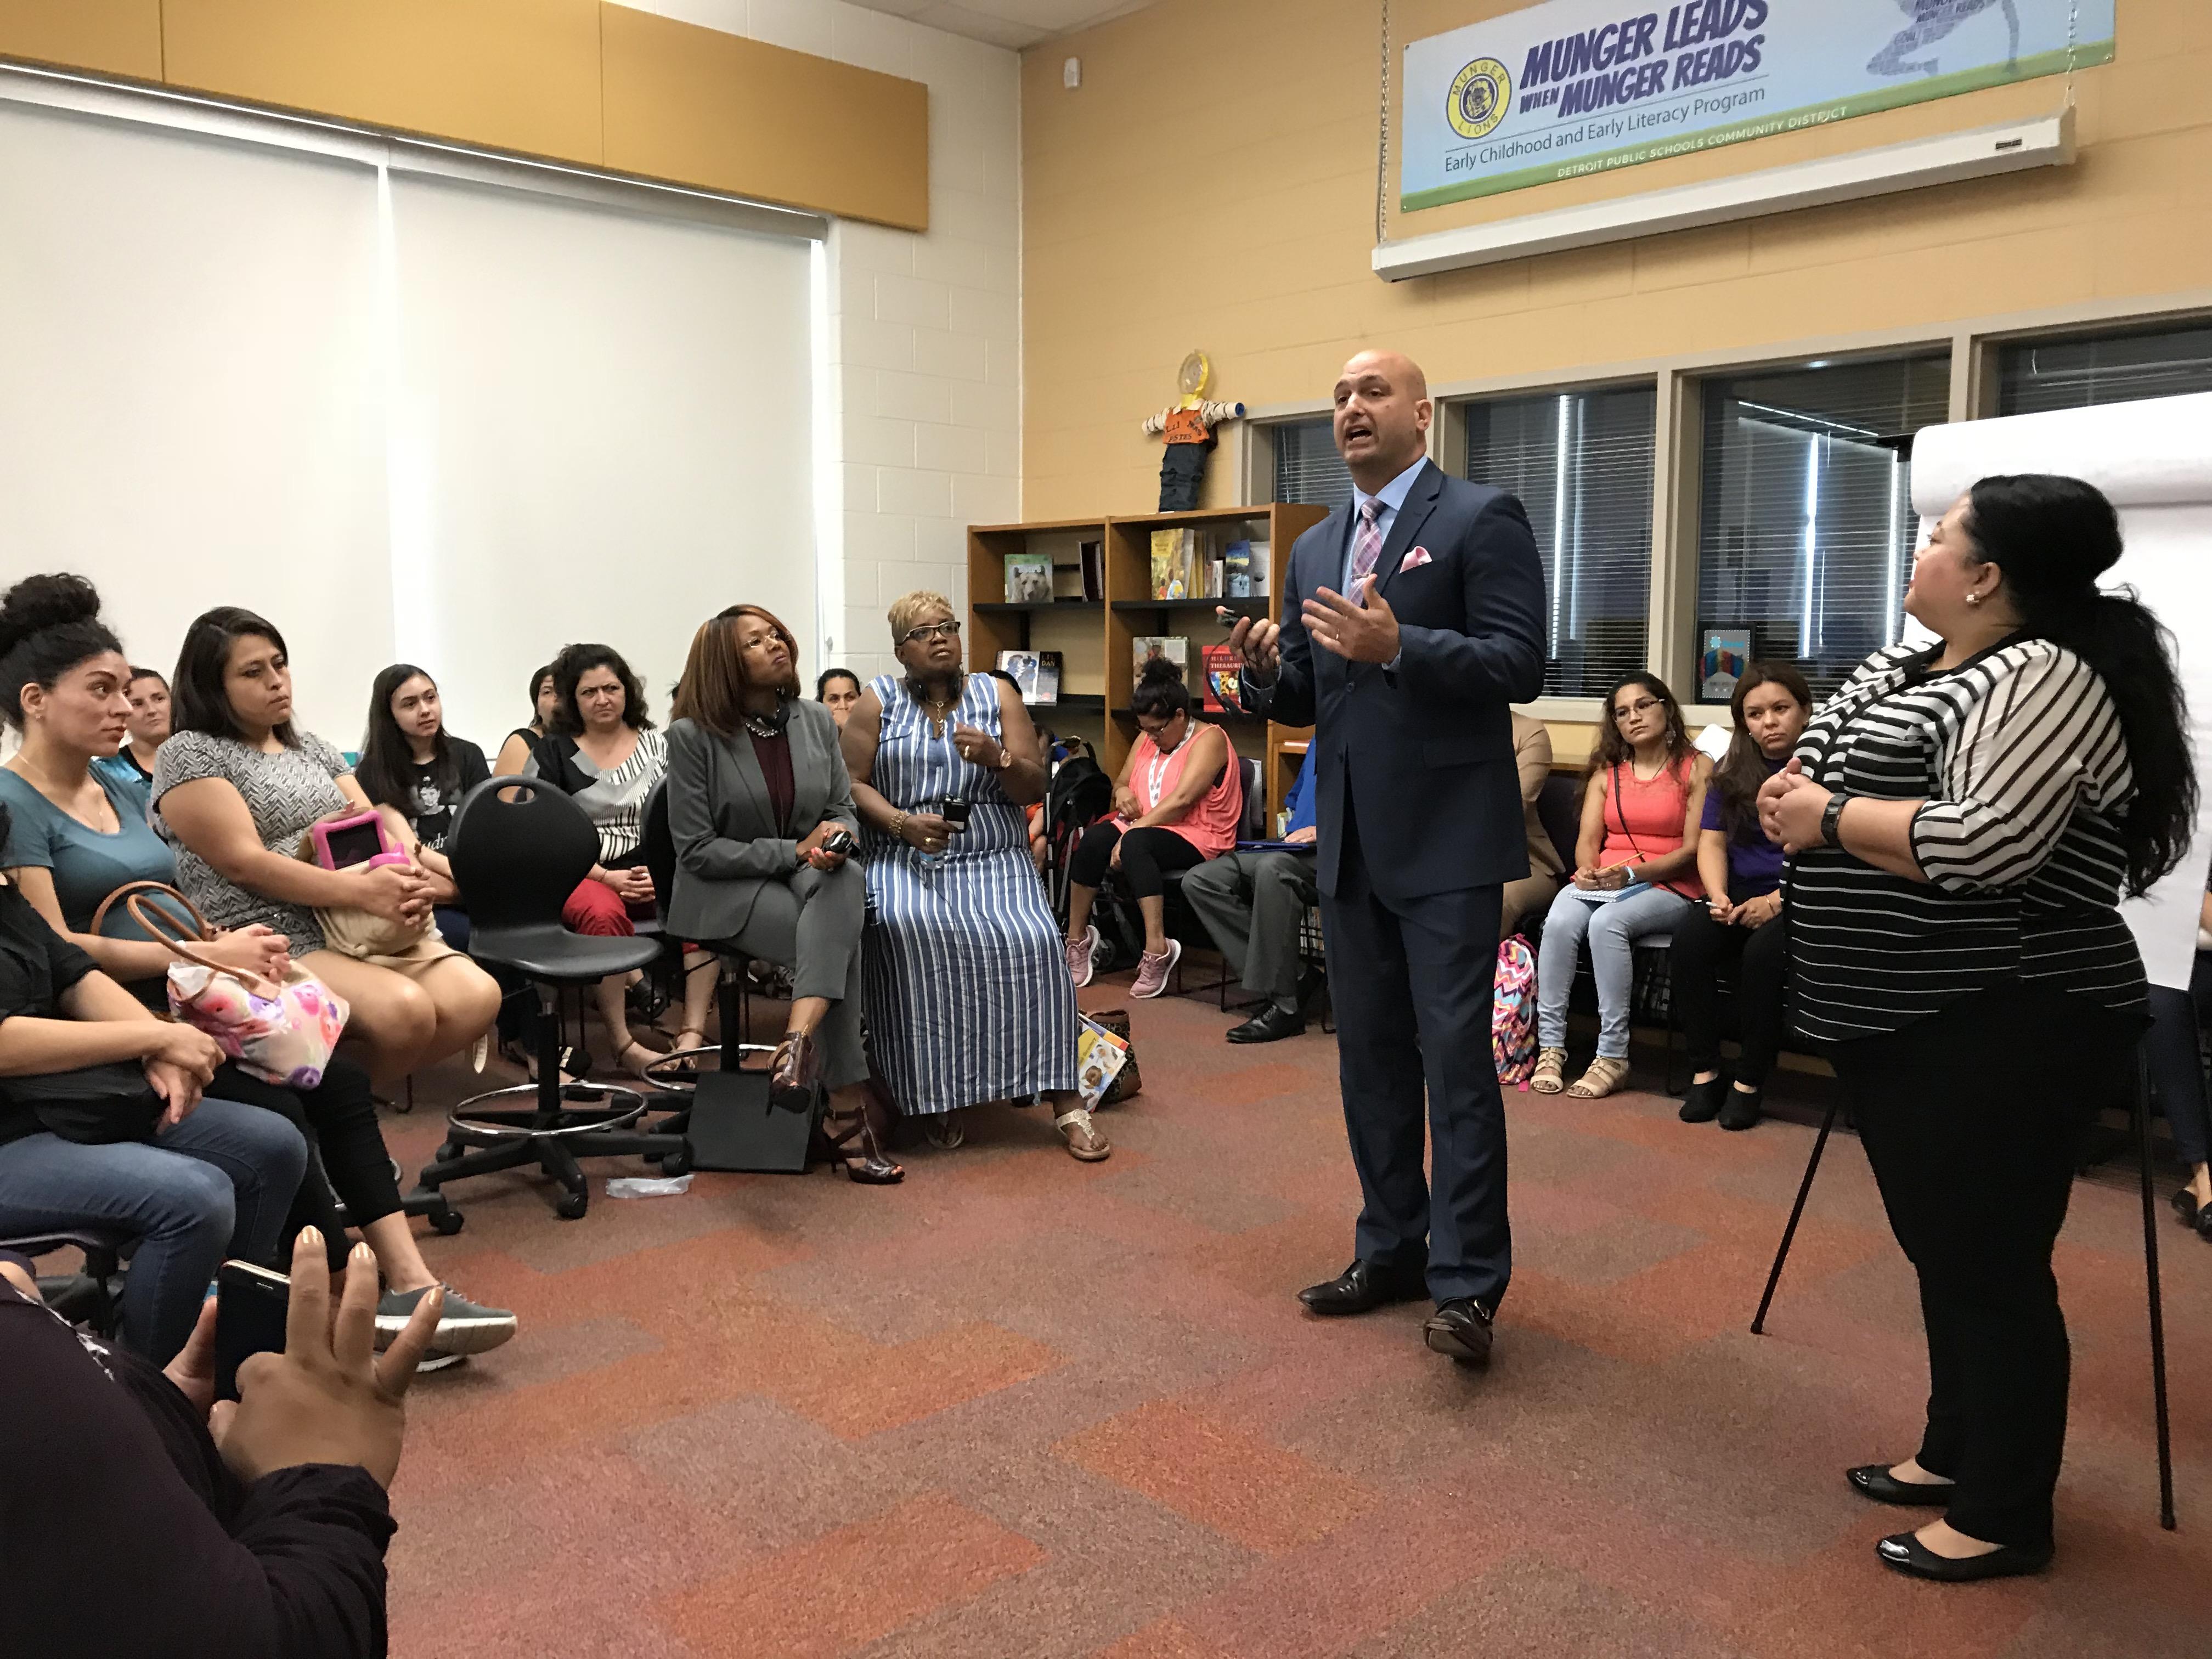 Detroit schools superintendent Nikolai Vitti addresses Spanish-speaking parents during a forum at Munger Elementary-Middle School.